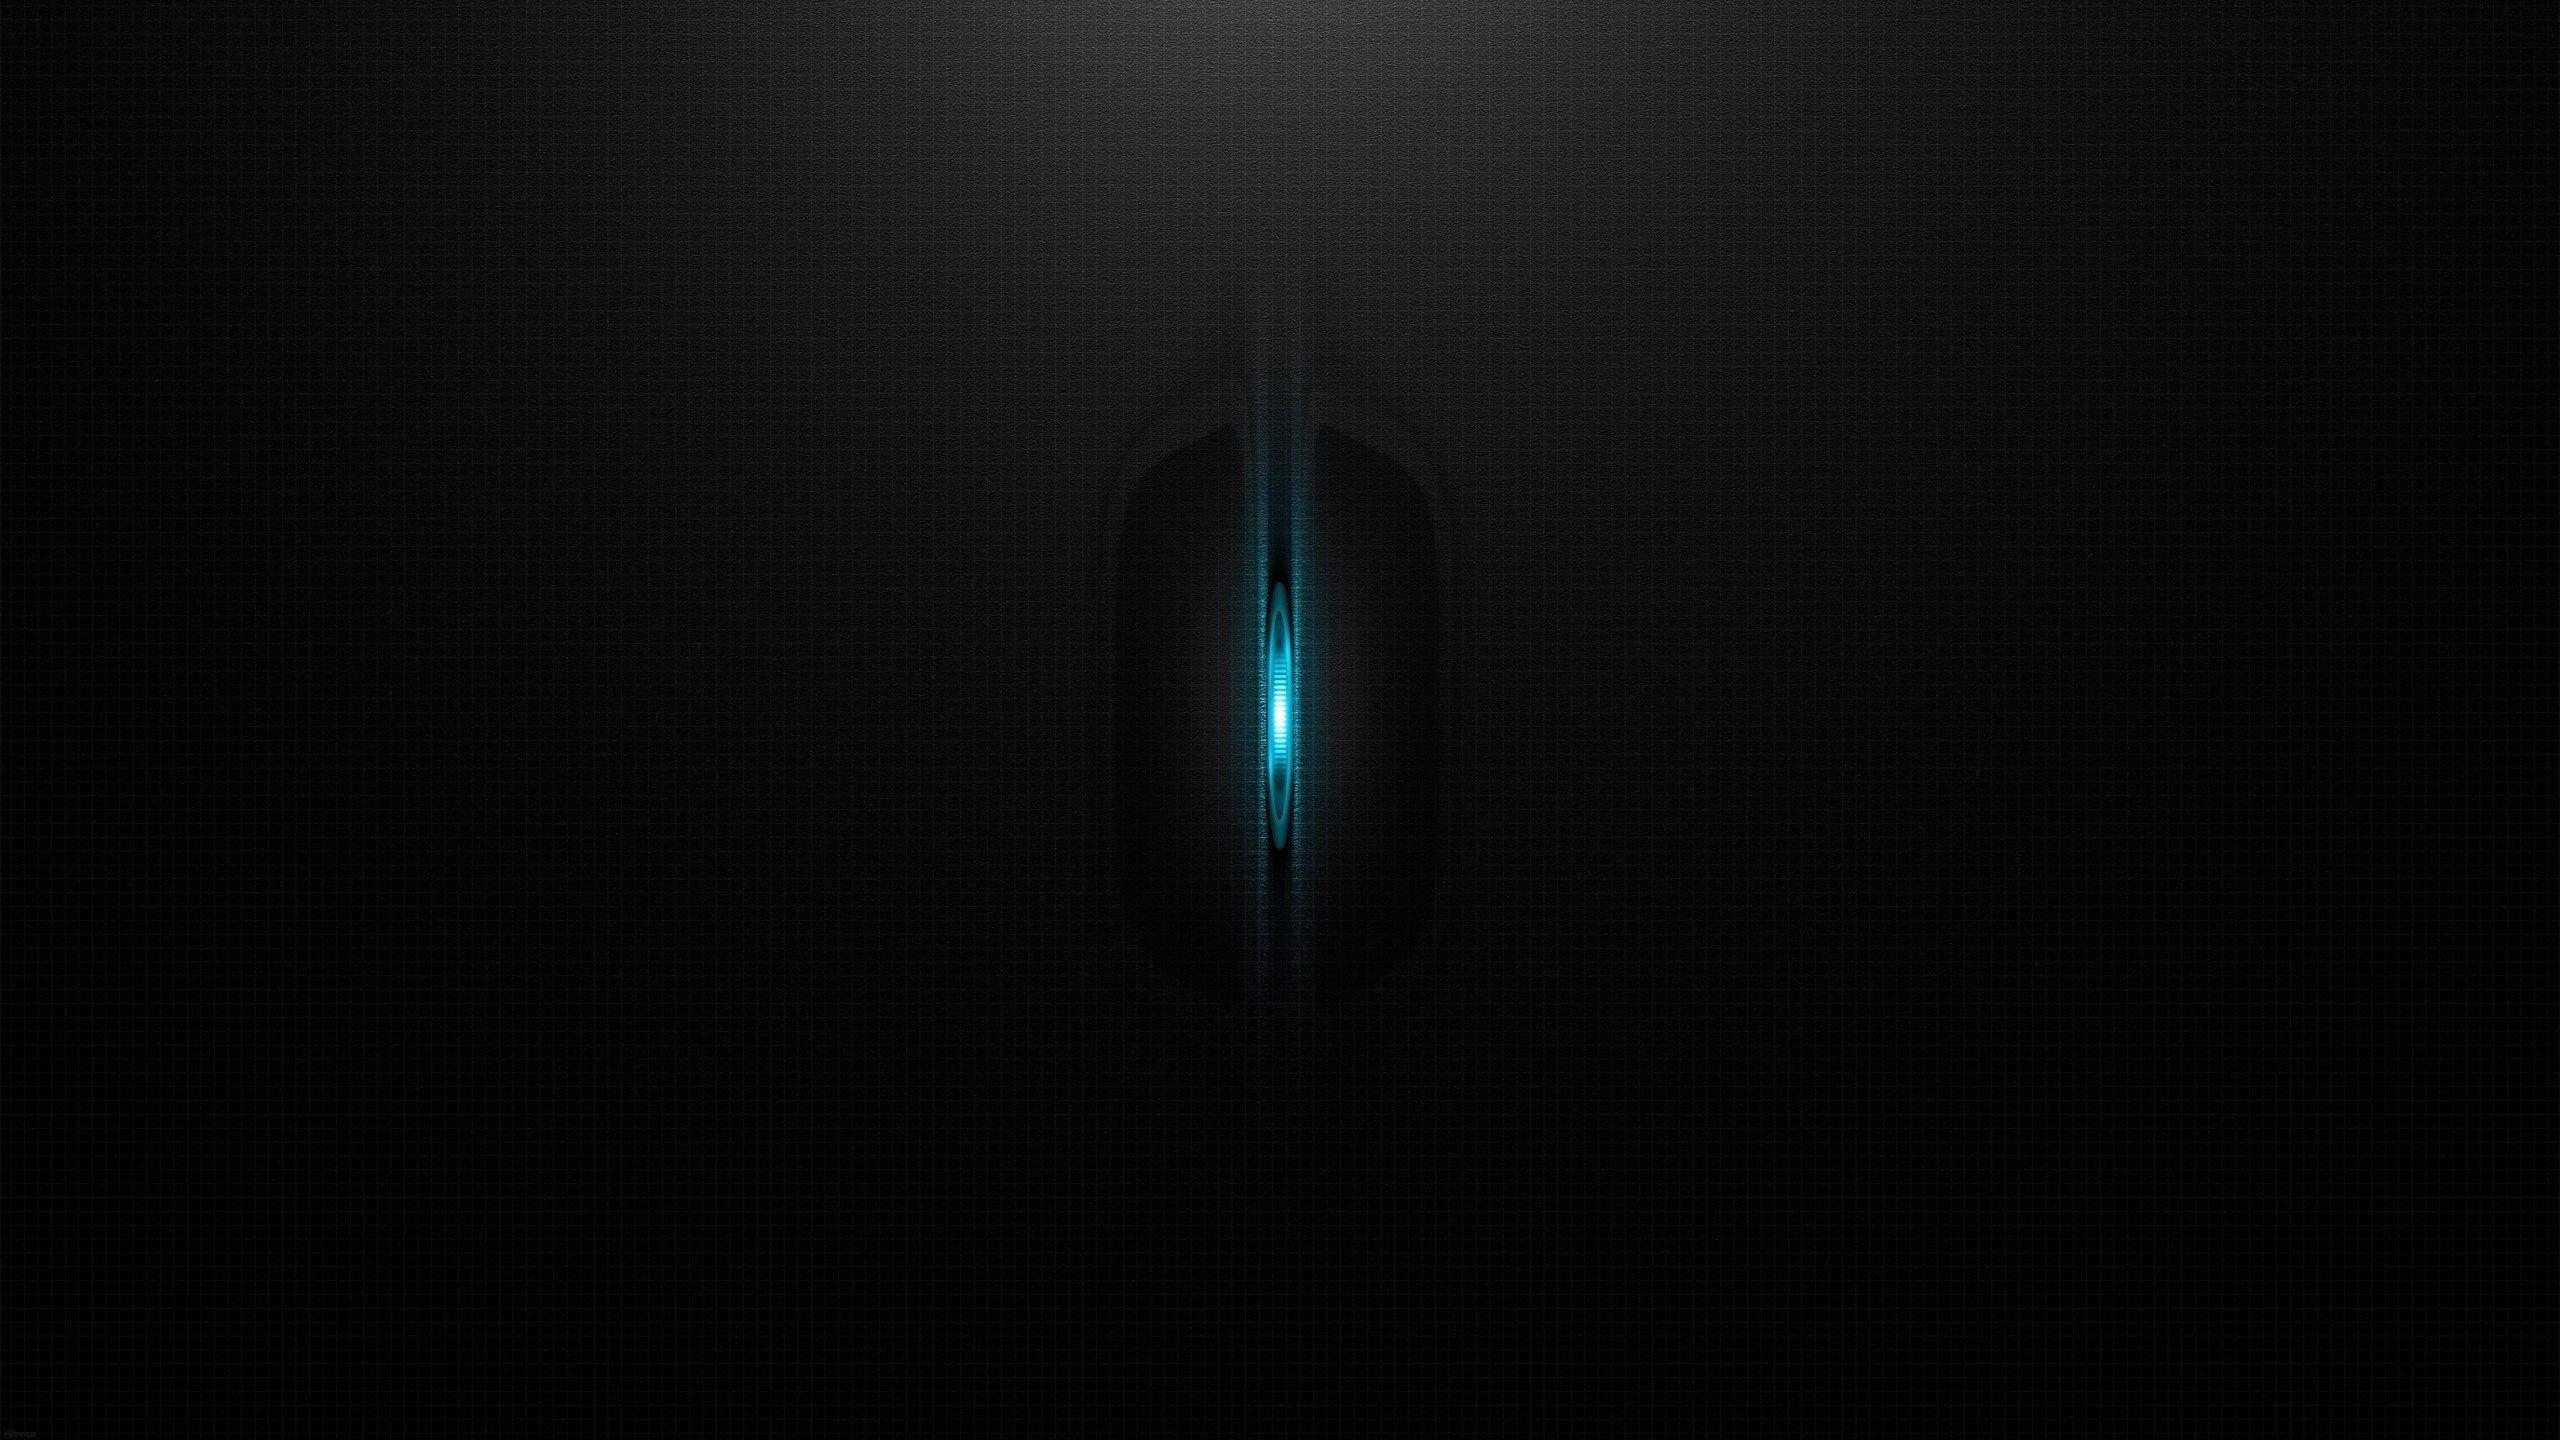 dark - Full HD Background